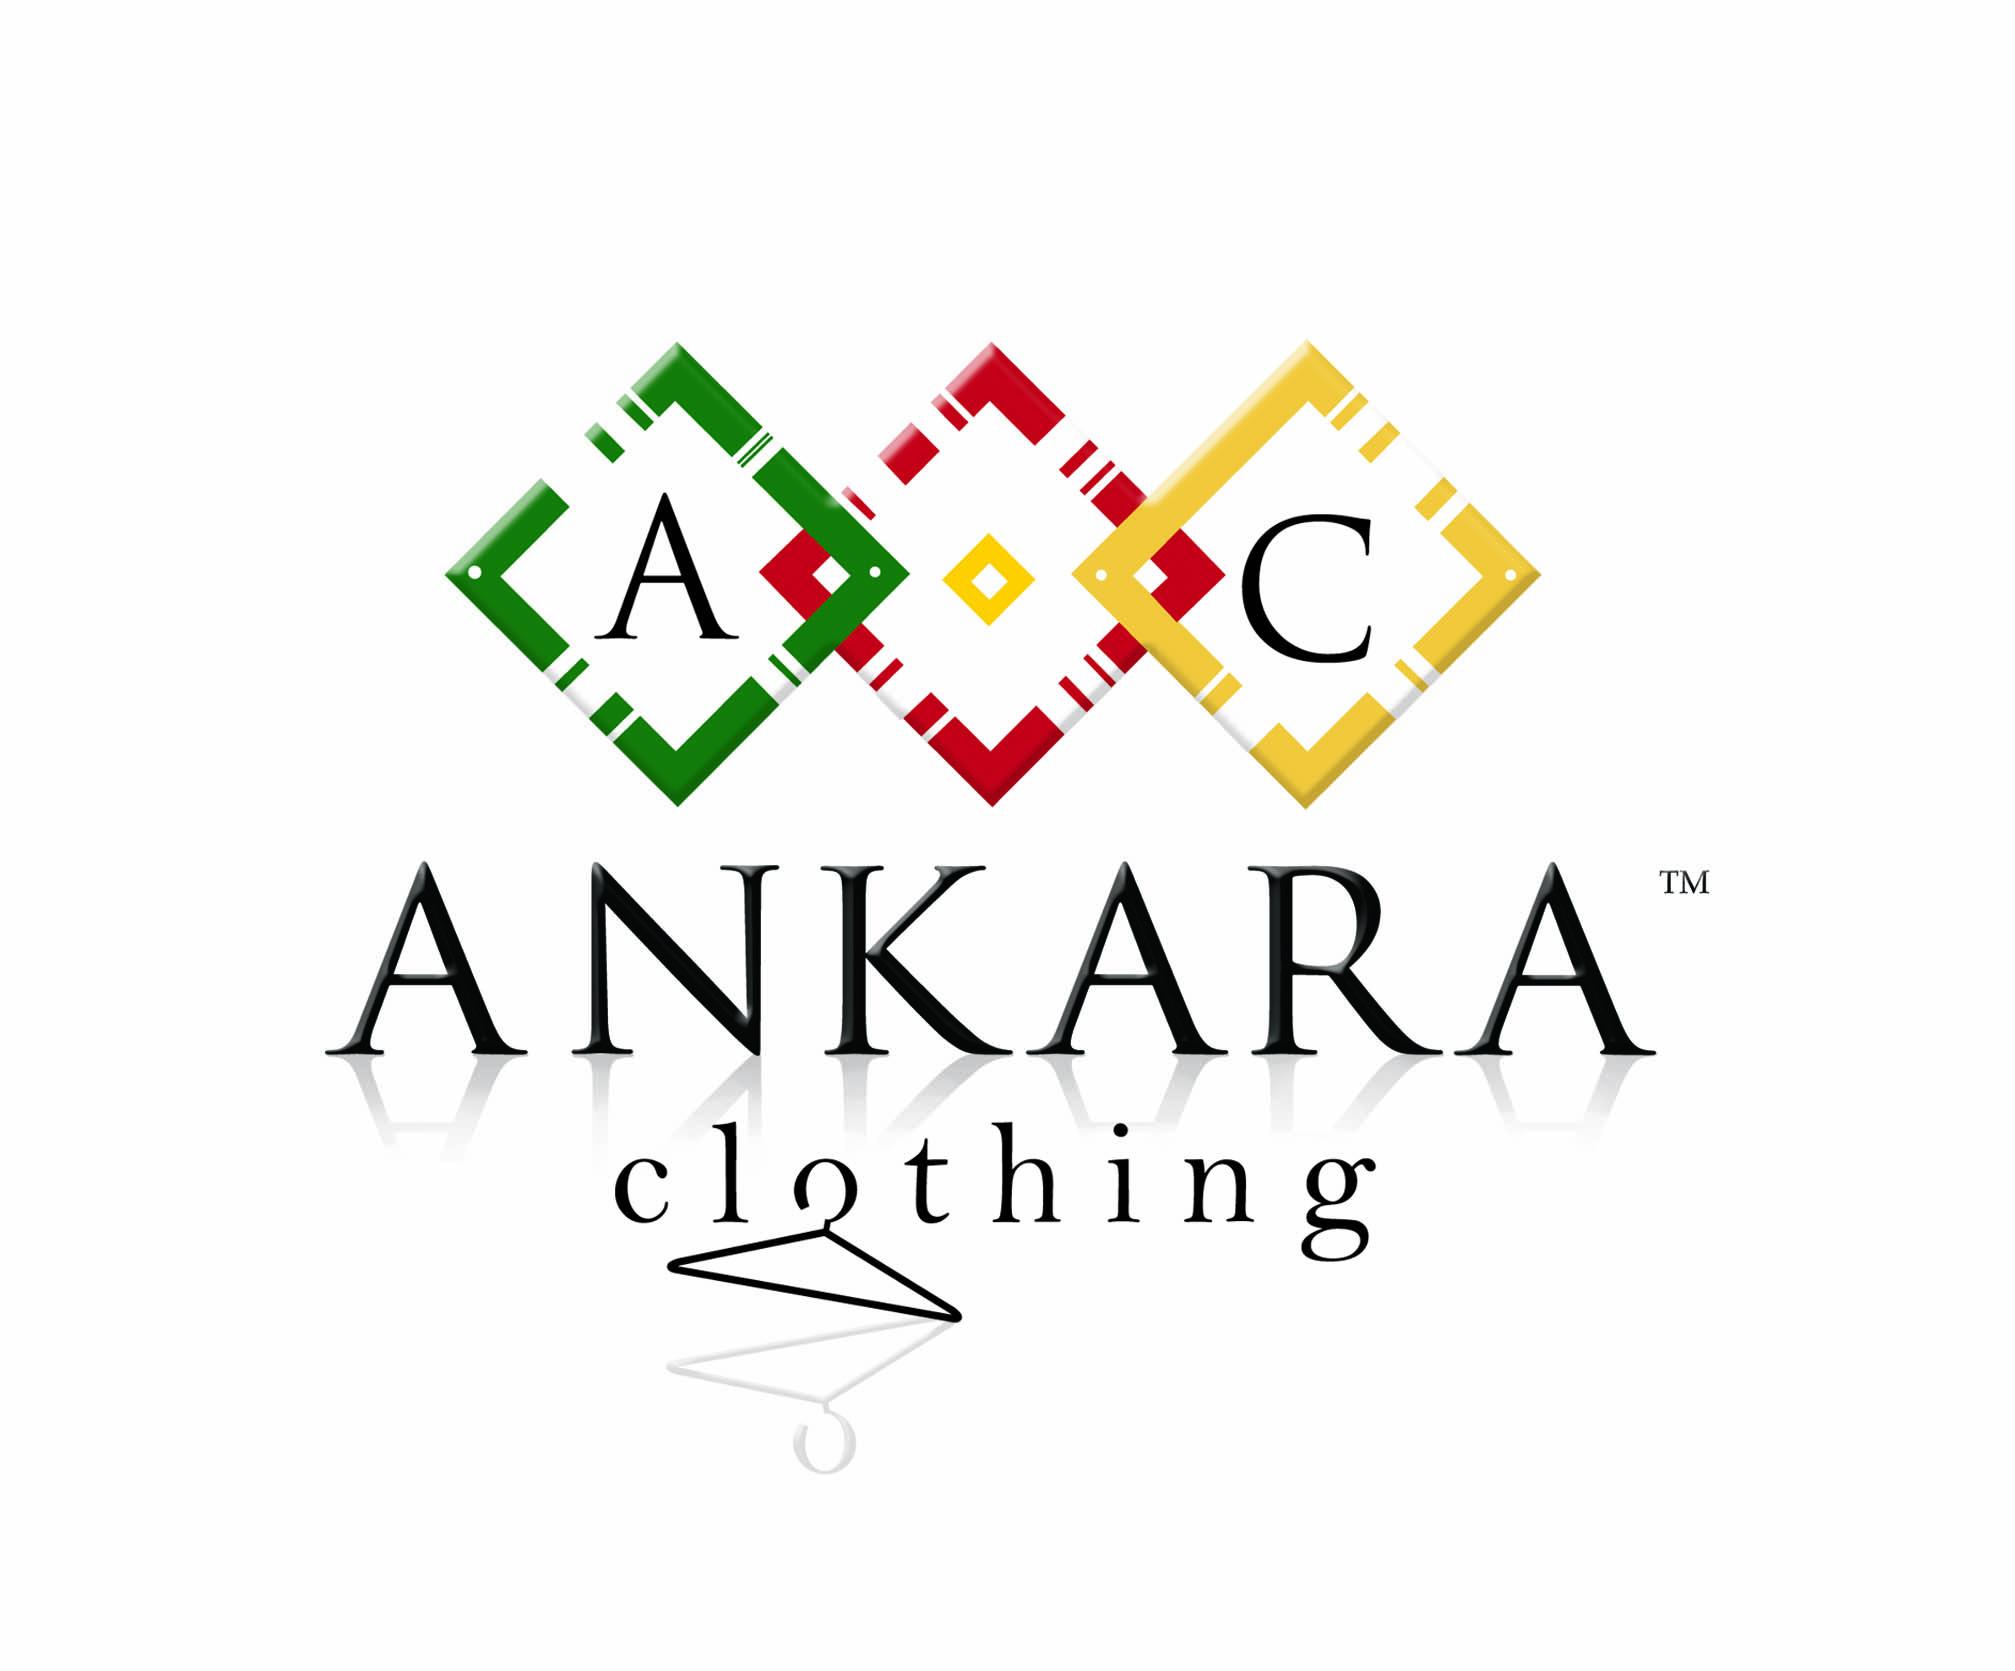 Clothing Brand Logos Images 2015x1671